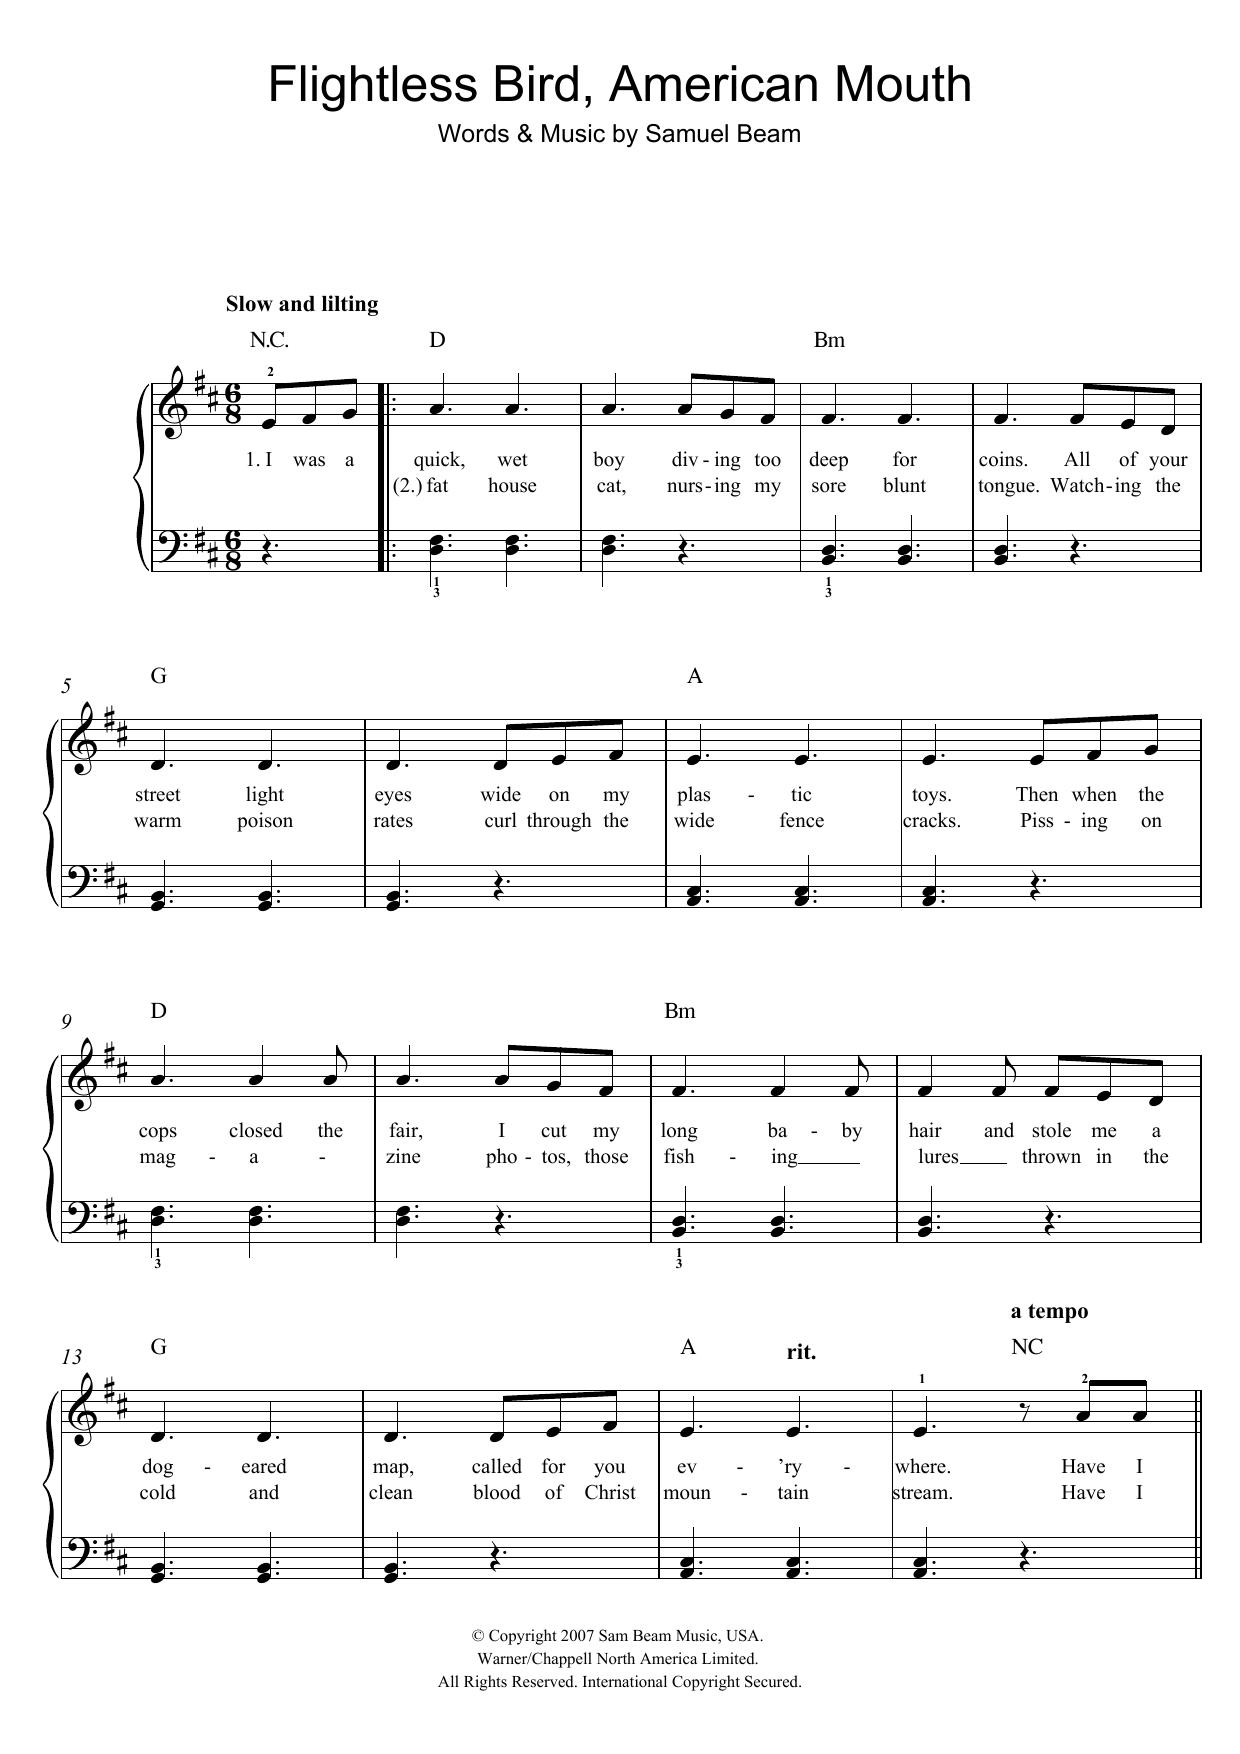 Sheet Music Digital Files To Print Licensed Samuel Beam Digital